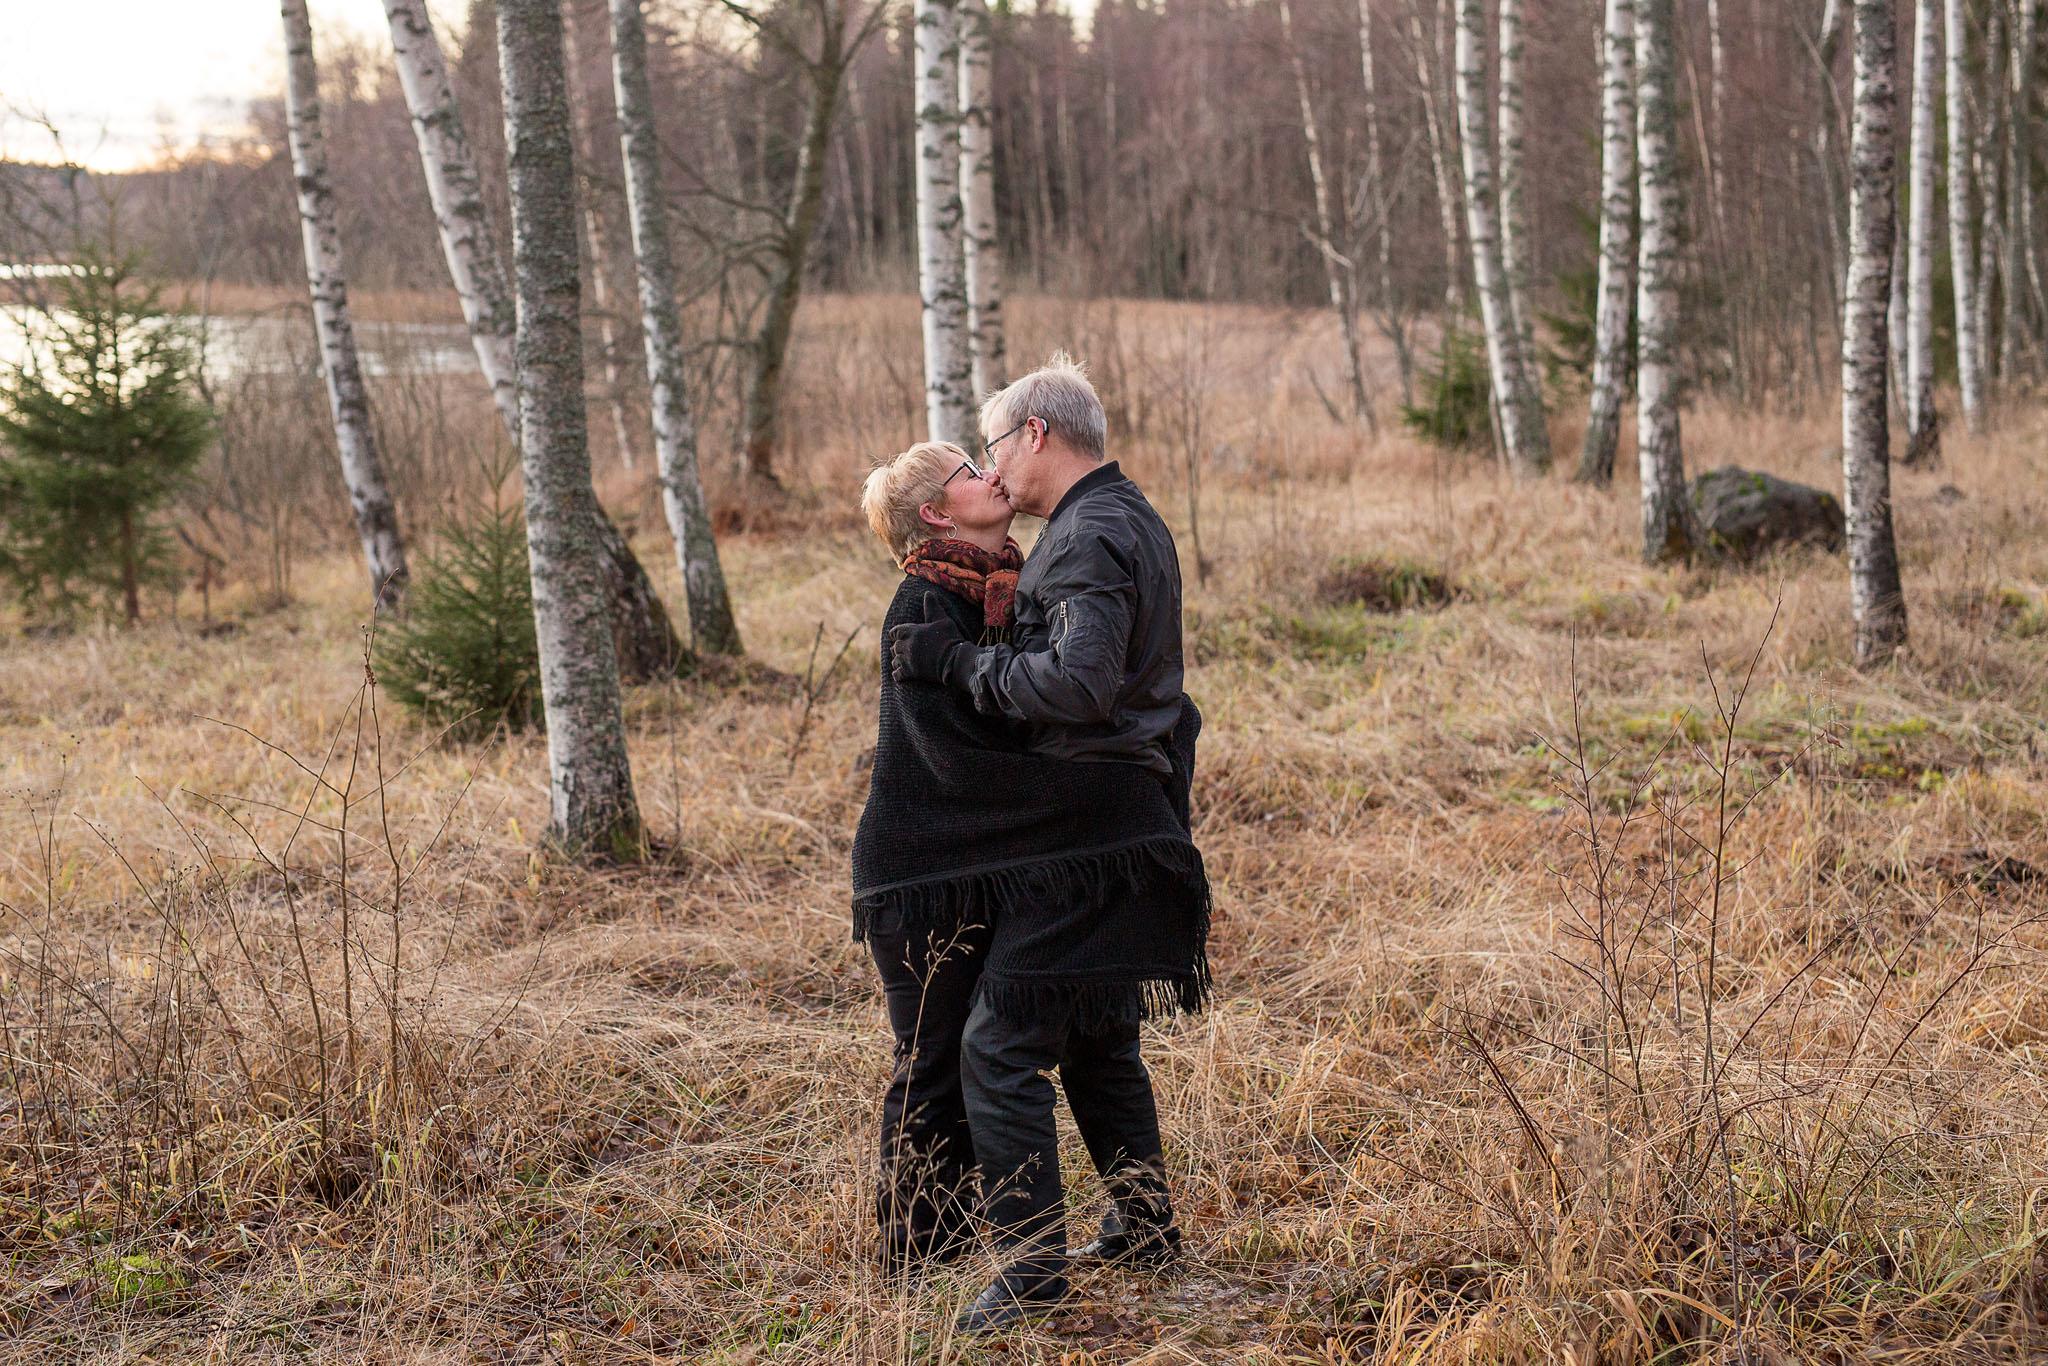 fotograf_sabina_wixner_hudiksvall.jpg